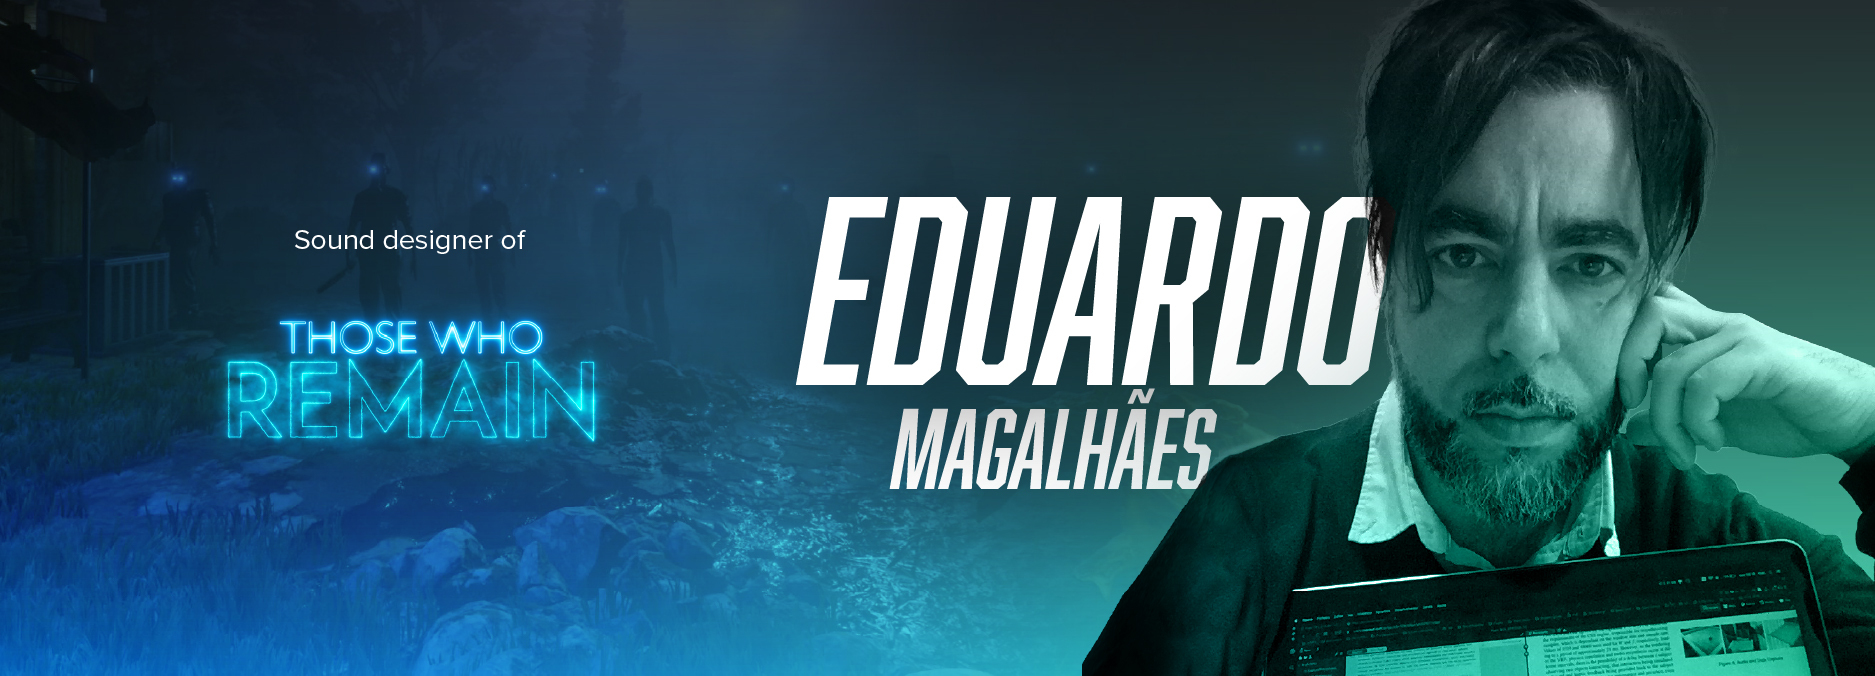 multiple-interviewees-blogpost-eduardo